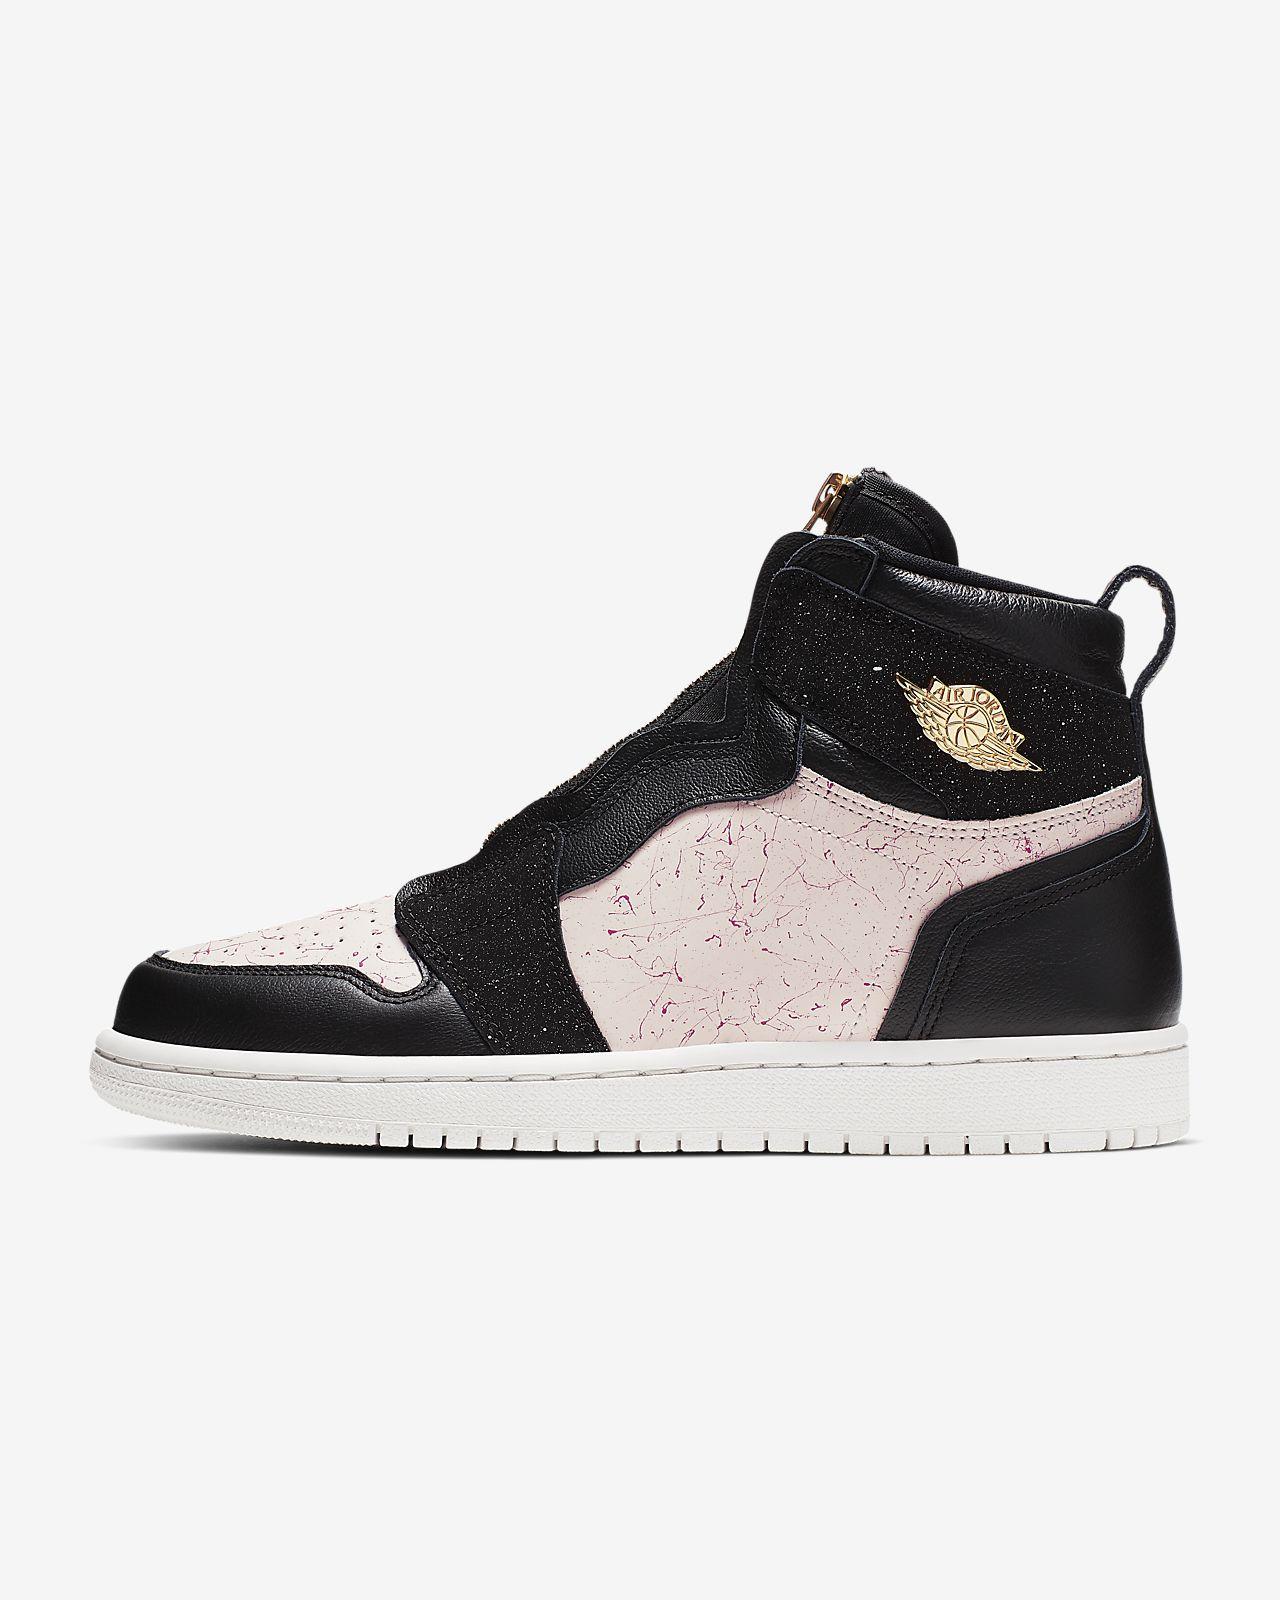 9cf38fe614ca2 Air Jordan 1 High Zip Women s Shoe. Nike.com CH